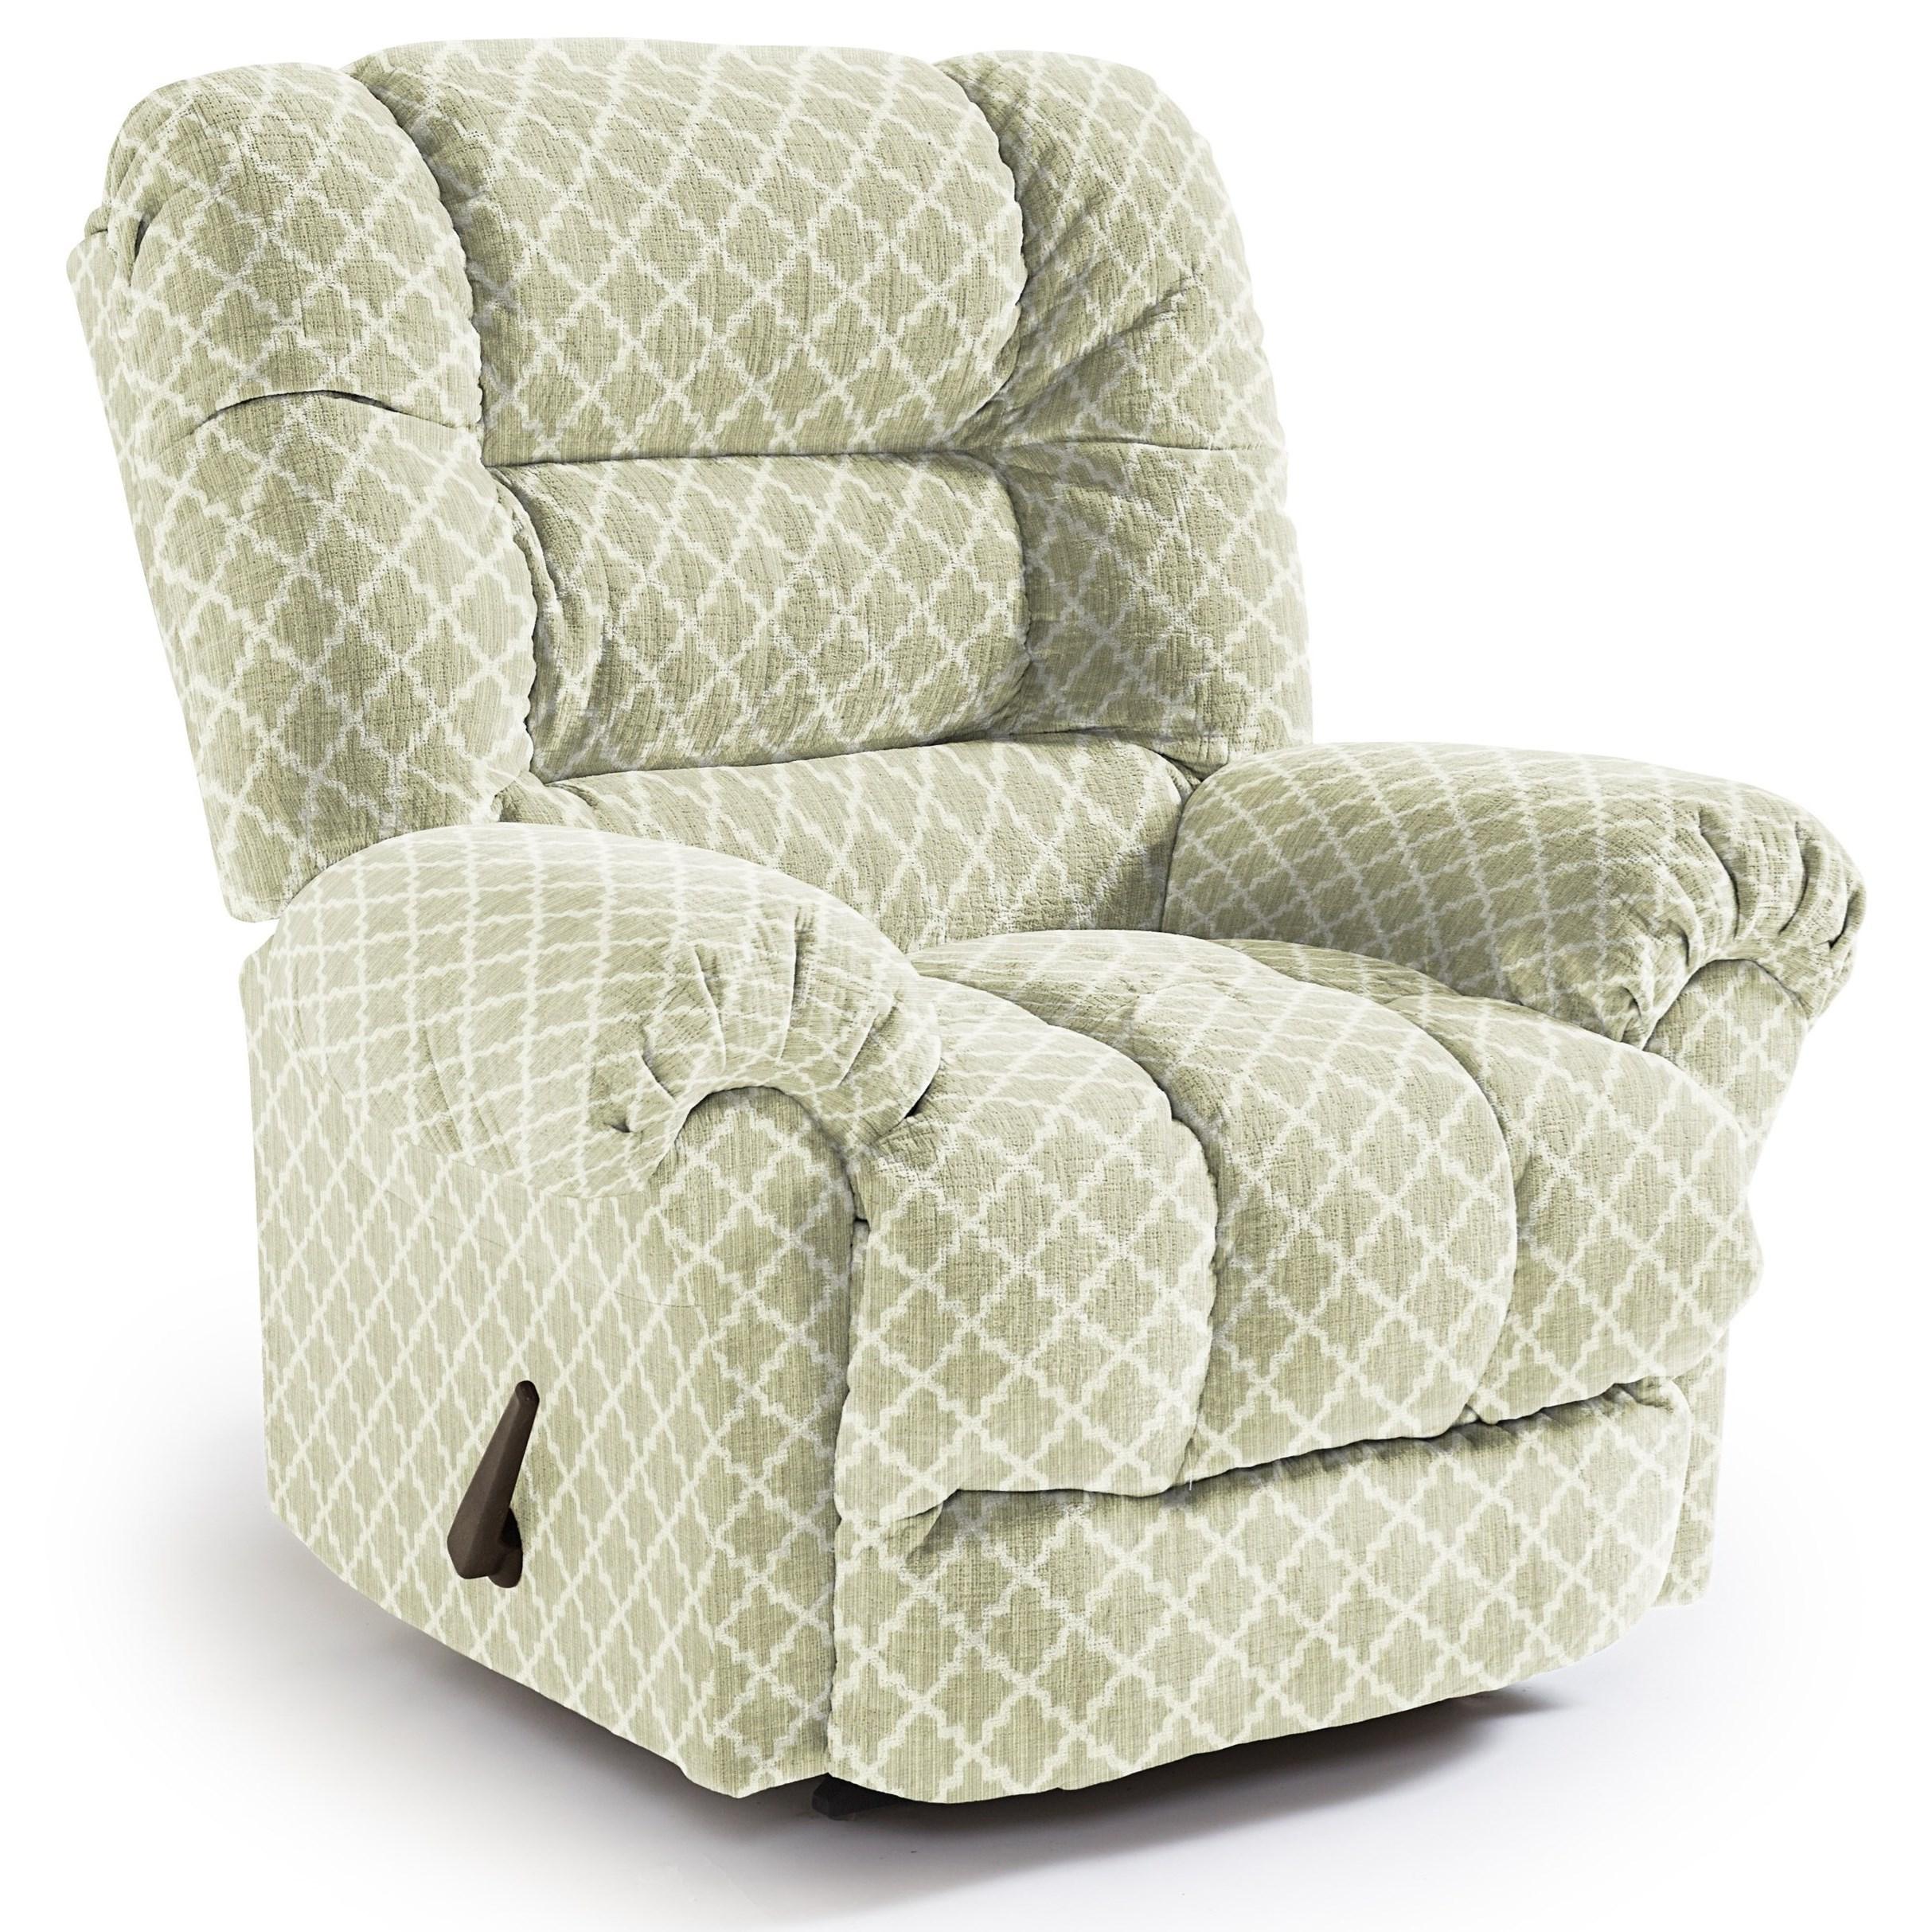 Medium Recliners Seger Swivel Glider Recliner by Best Home Furnishings at Lucas Furniture & Mattress